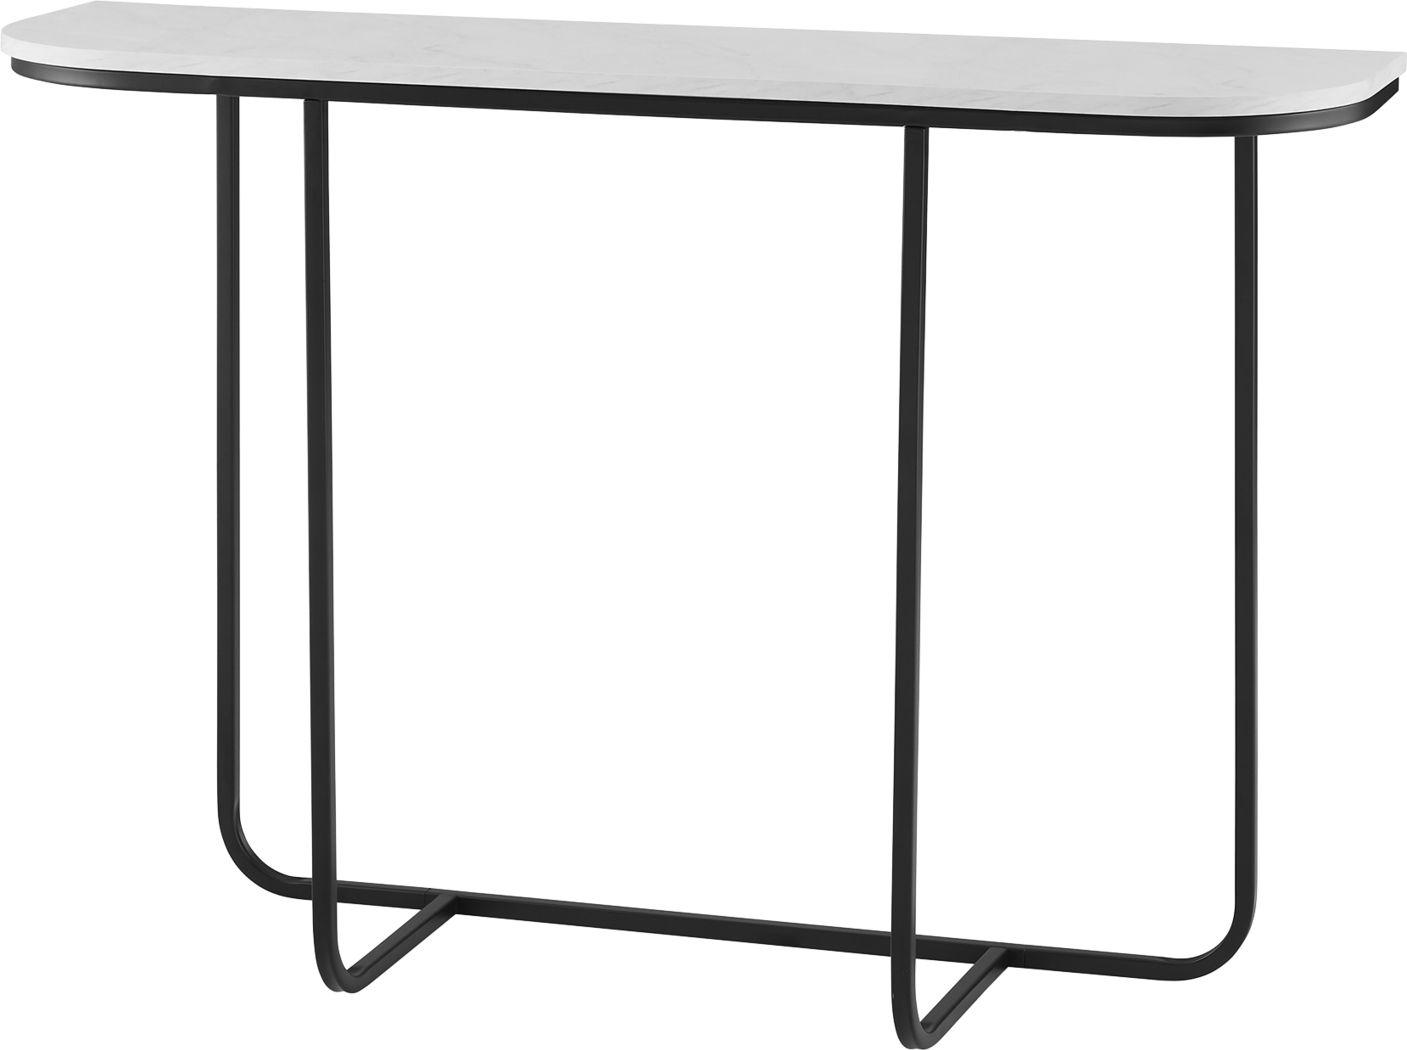 Picotte White Sofa Table